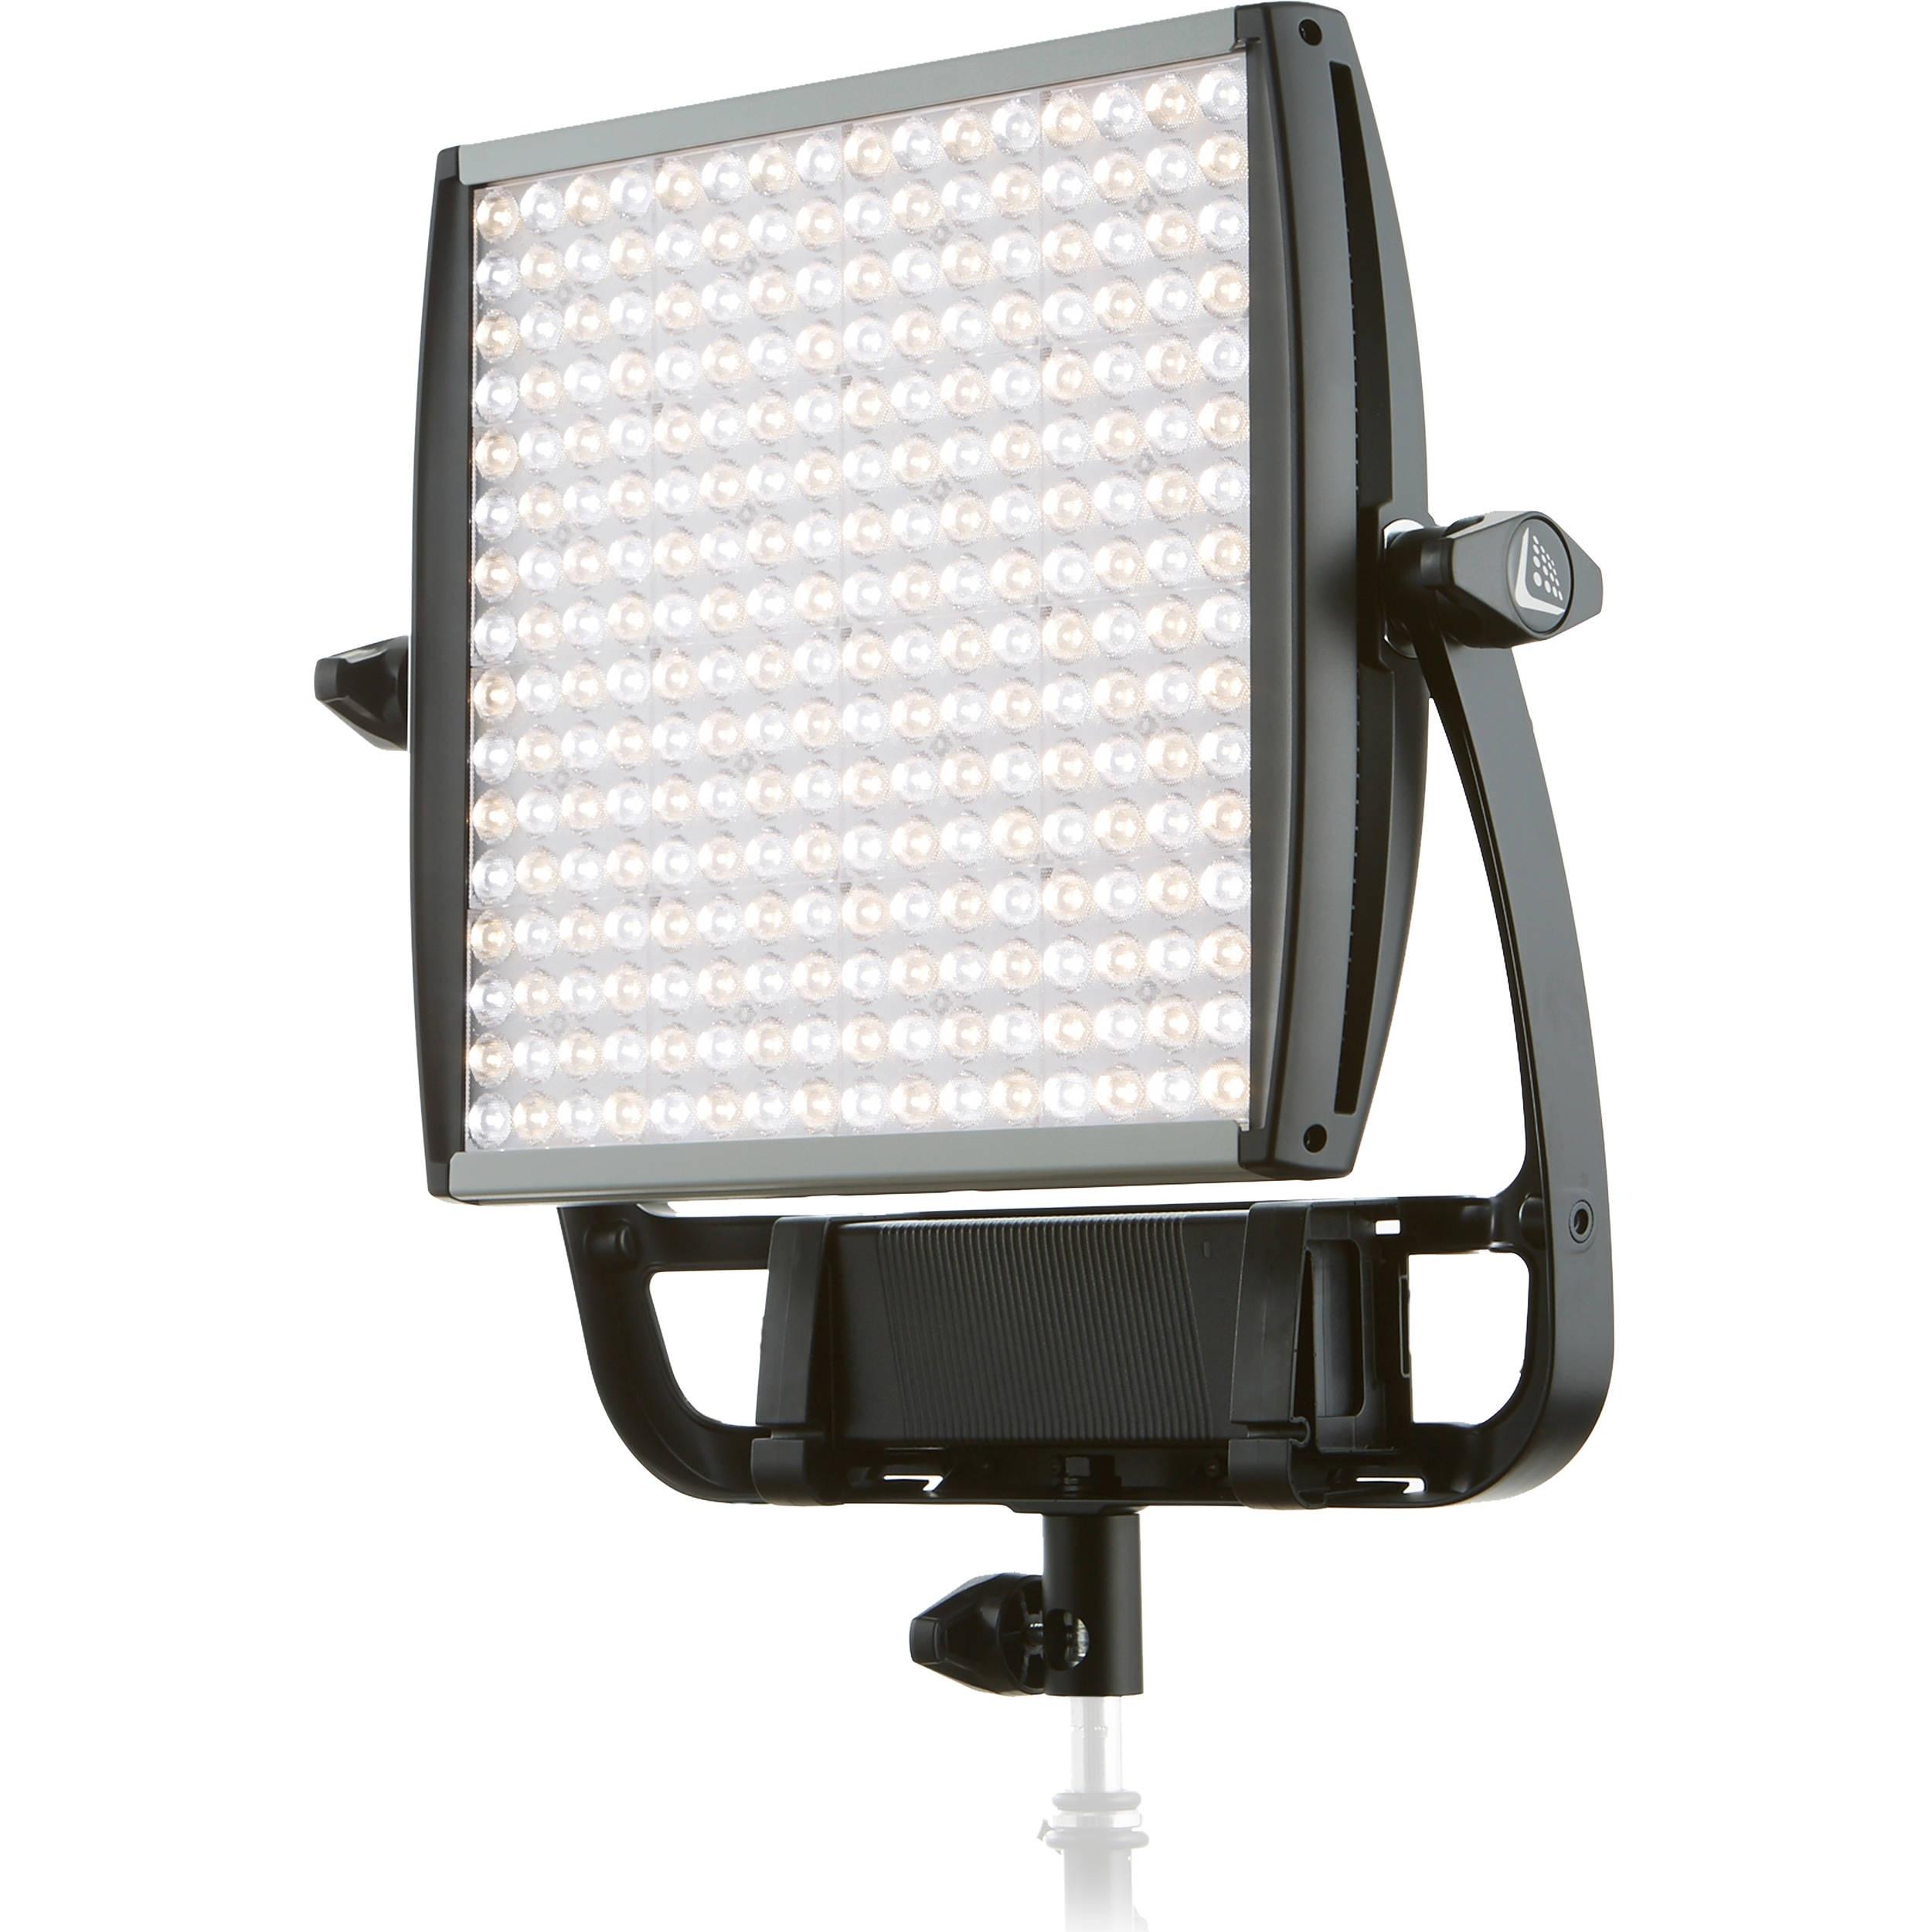 Litepanels Astra 3X Bi-Colour LED Panel